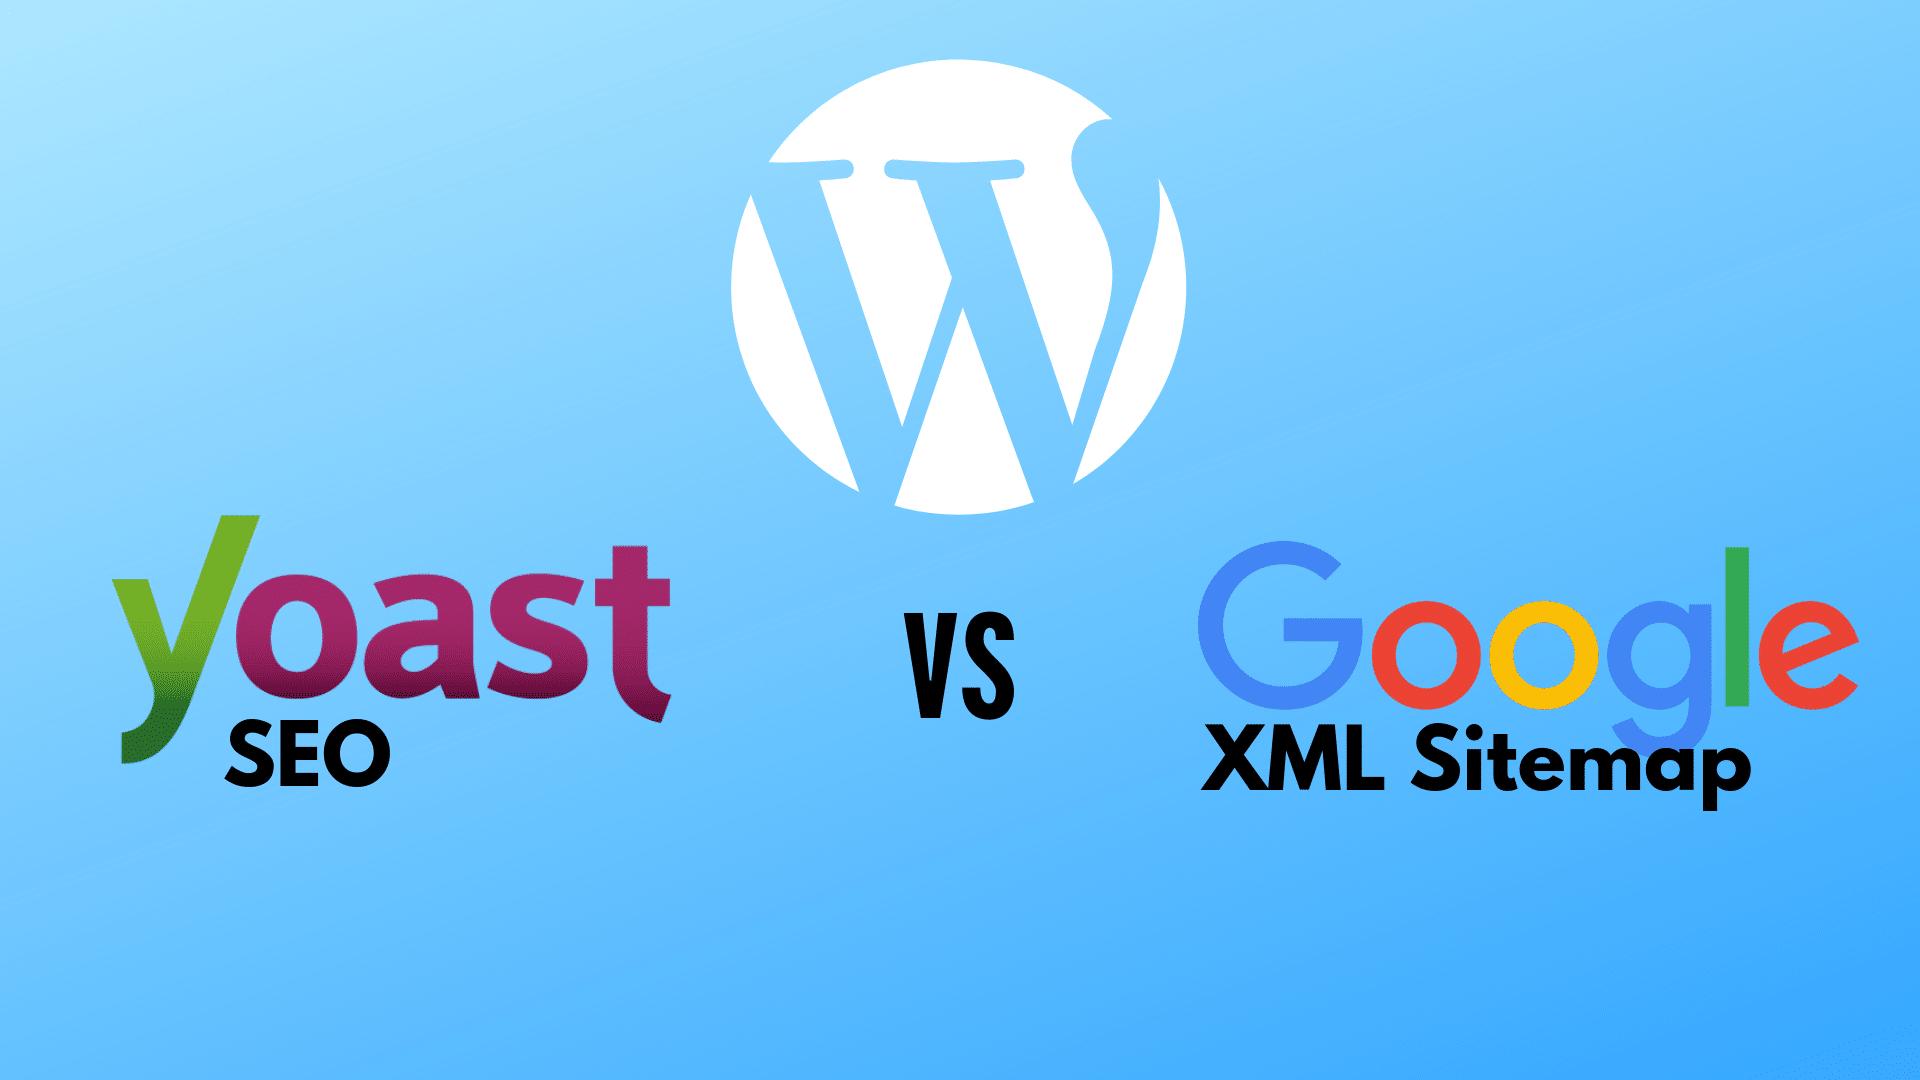 Yoast SEO vs Google XML Sitemap